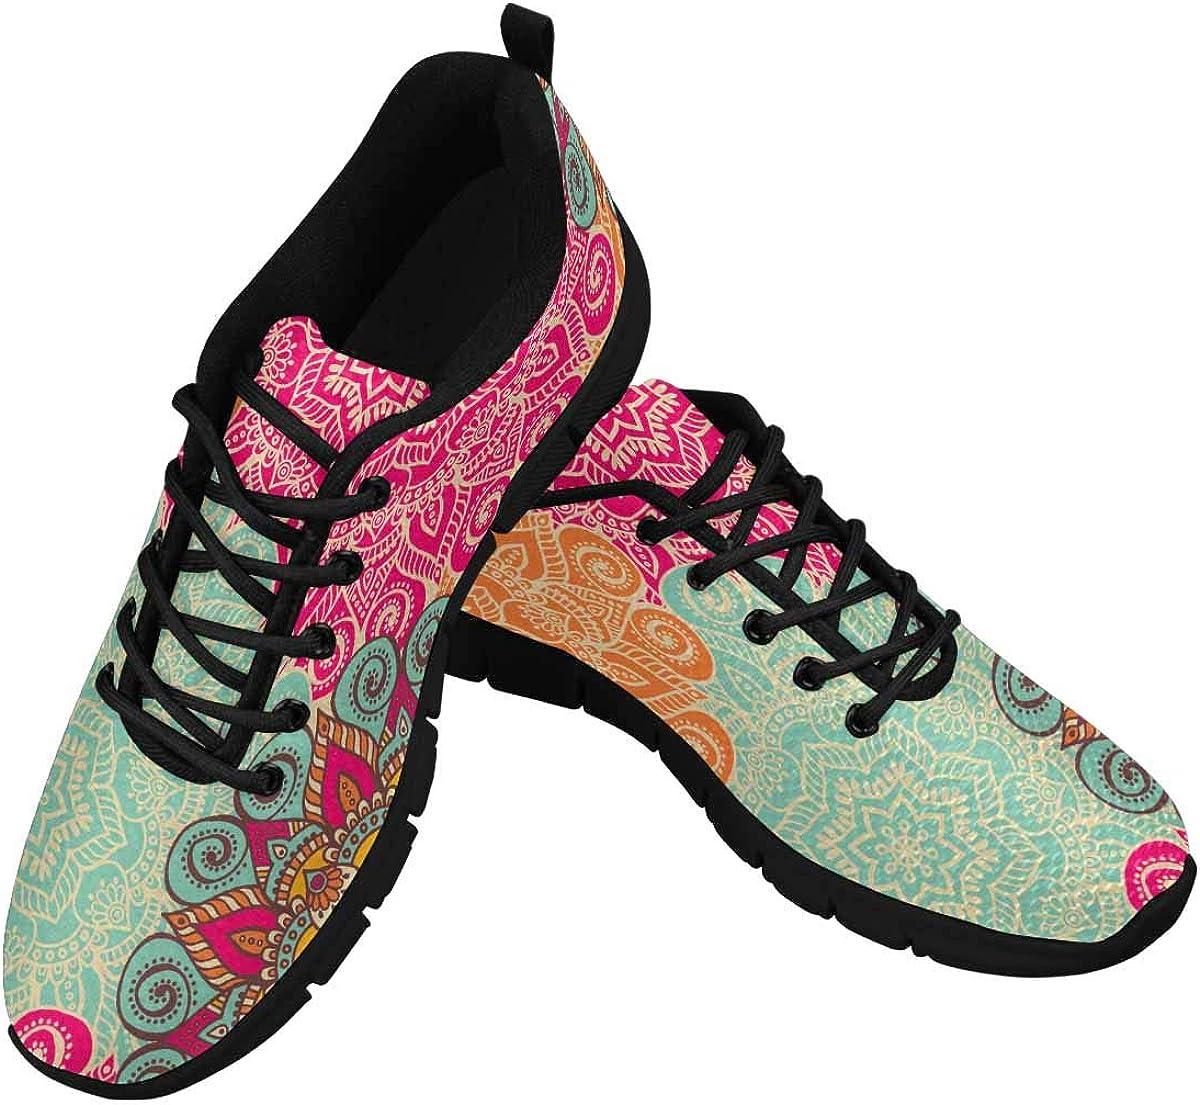 InterestPrint Ottoman Motifs Women Walking Shoes Comfortable Lightweight Work Casual Travel Sneakers